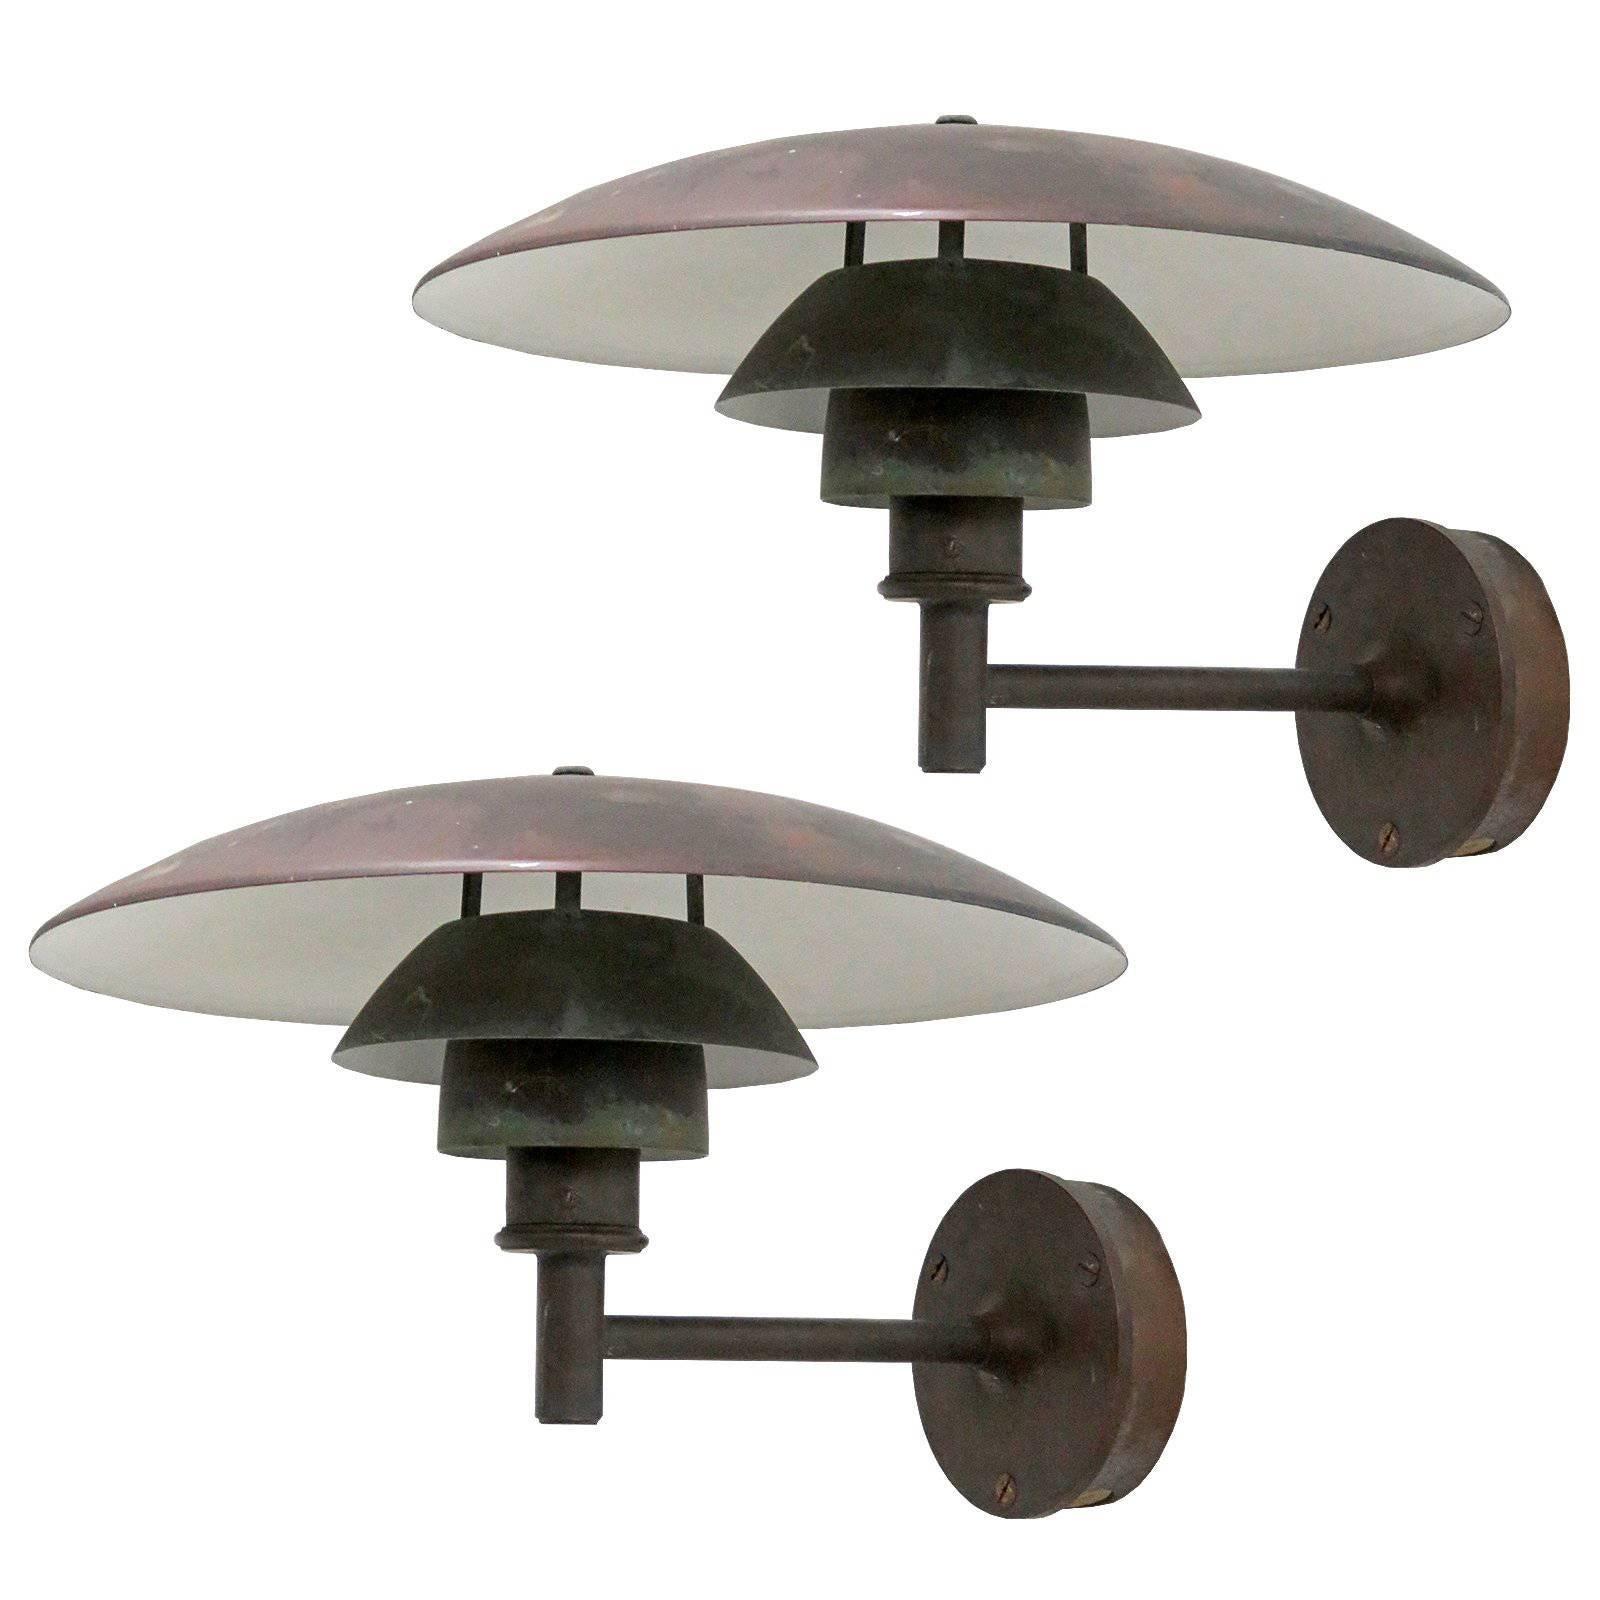 SET OF 4 Copper Wall Light by Poul Henningsen PH453 model For Sale